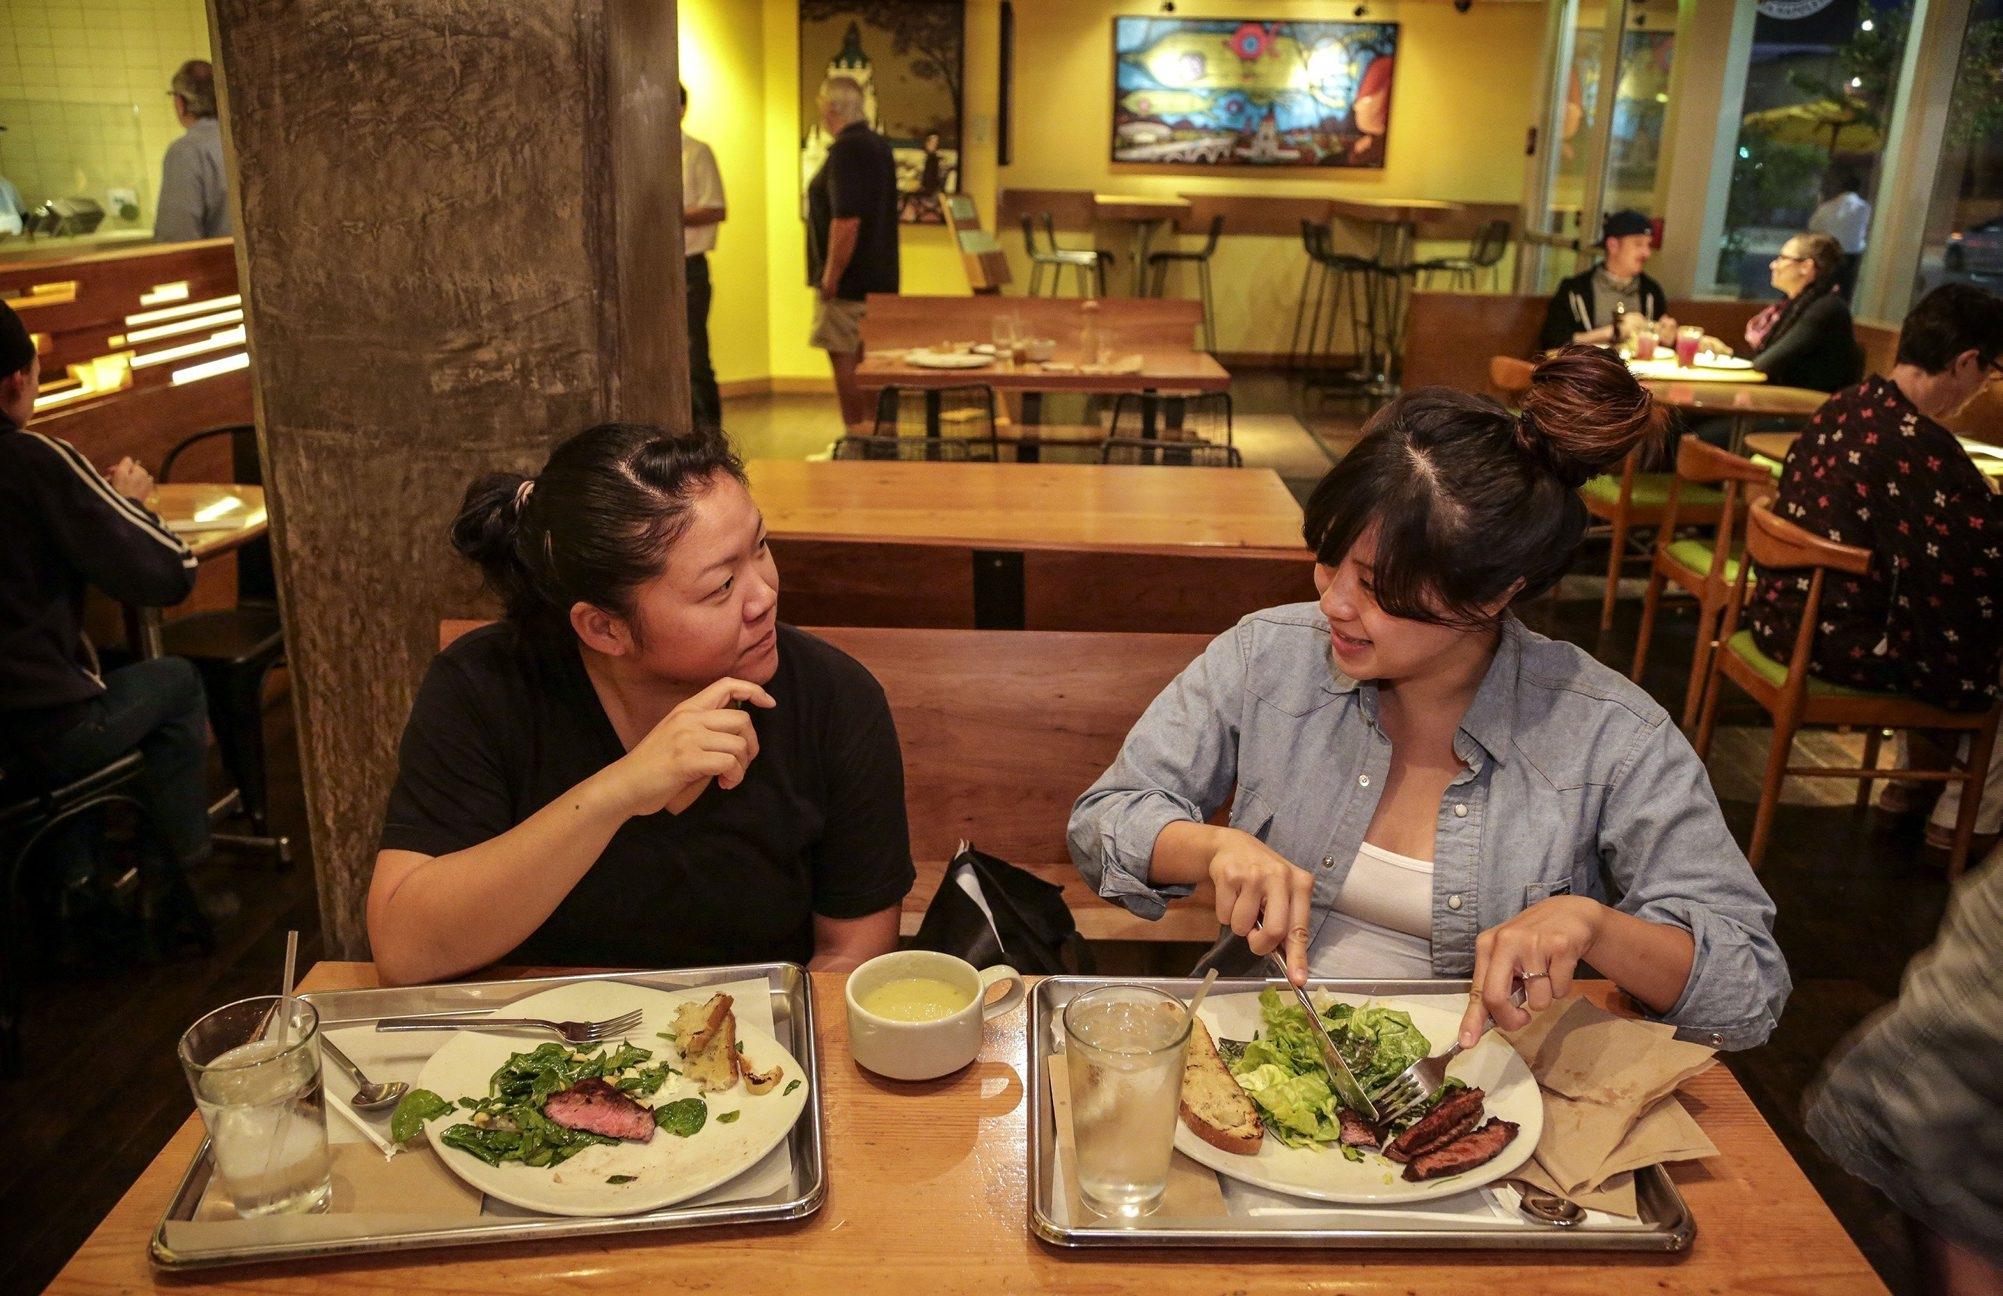 Johanna Tchon, left, and friend Jane Moro enjoy a meal of flatiron/backyard steak at Tender Greens in Pasadena, Calif.